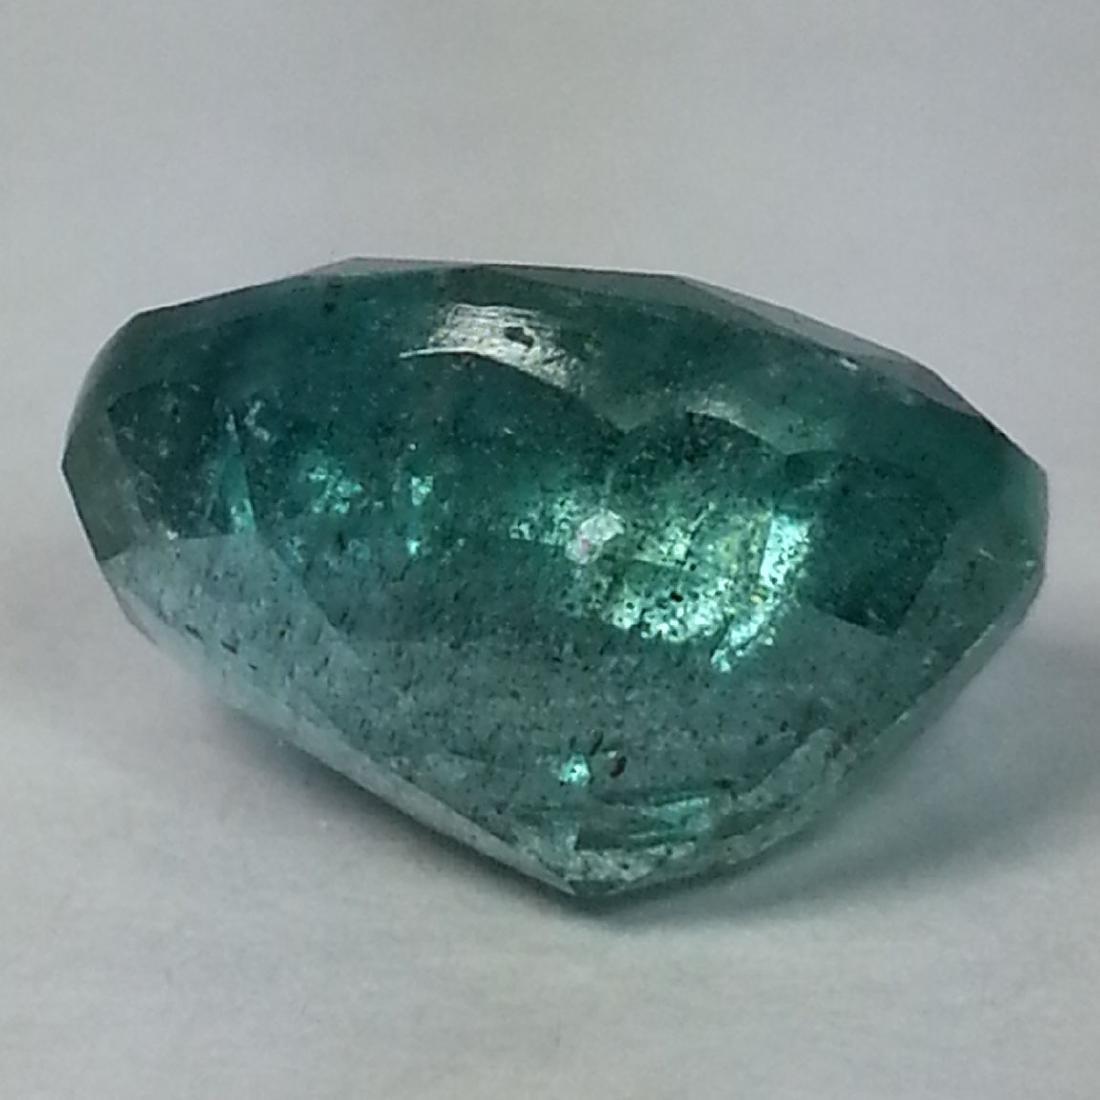 Emerald - 3.08 ct - 4